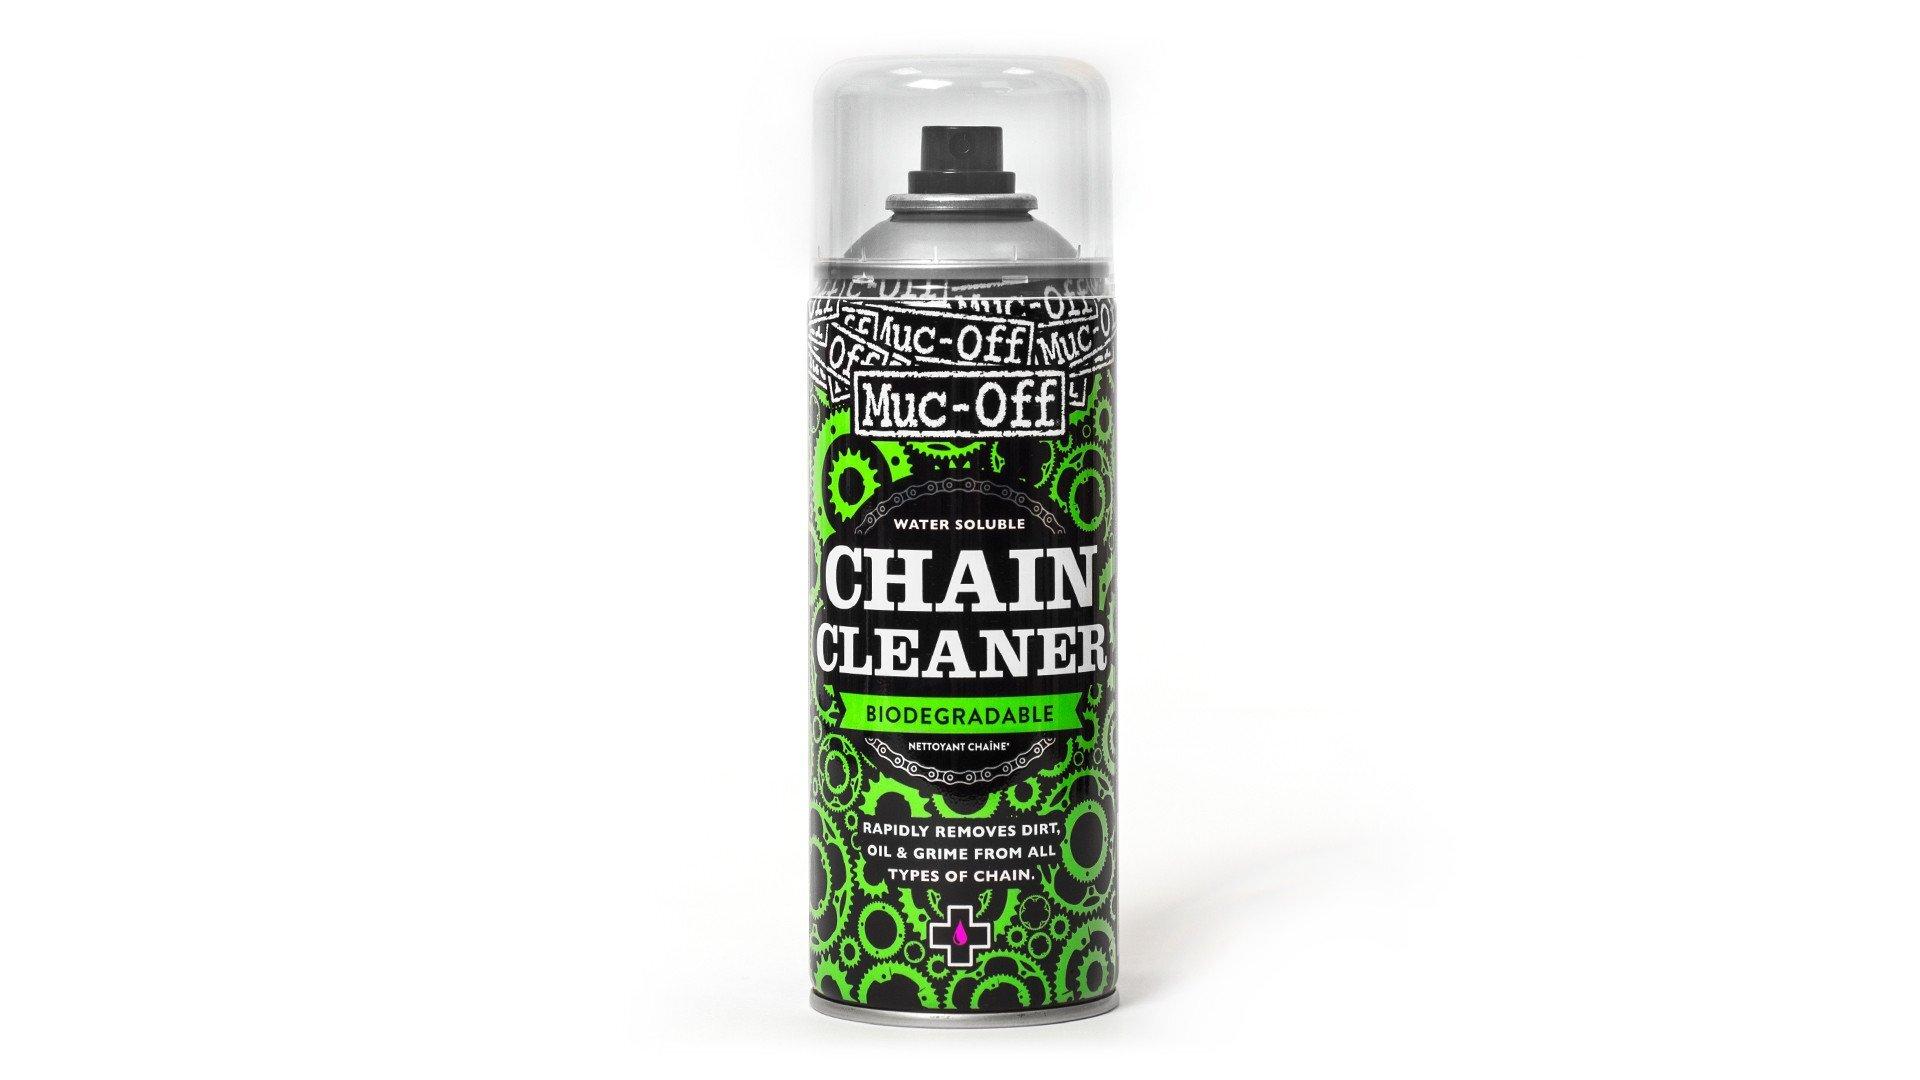 SPREJ ZA ČIŠĆENJE LANCA MUC-OFF BIO CHAIN CLEAN